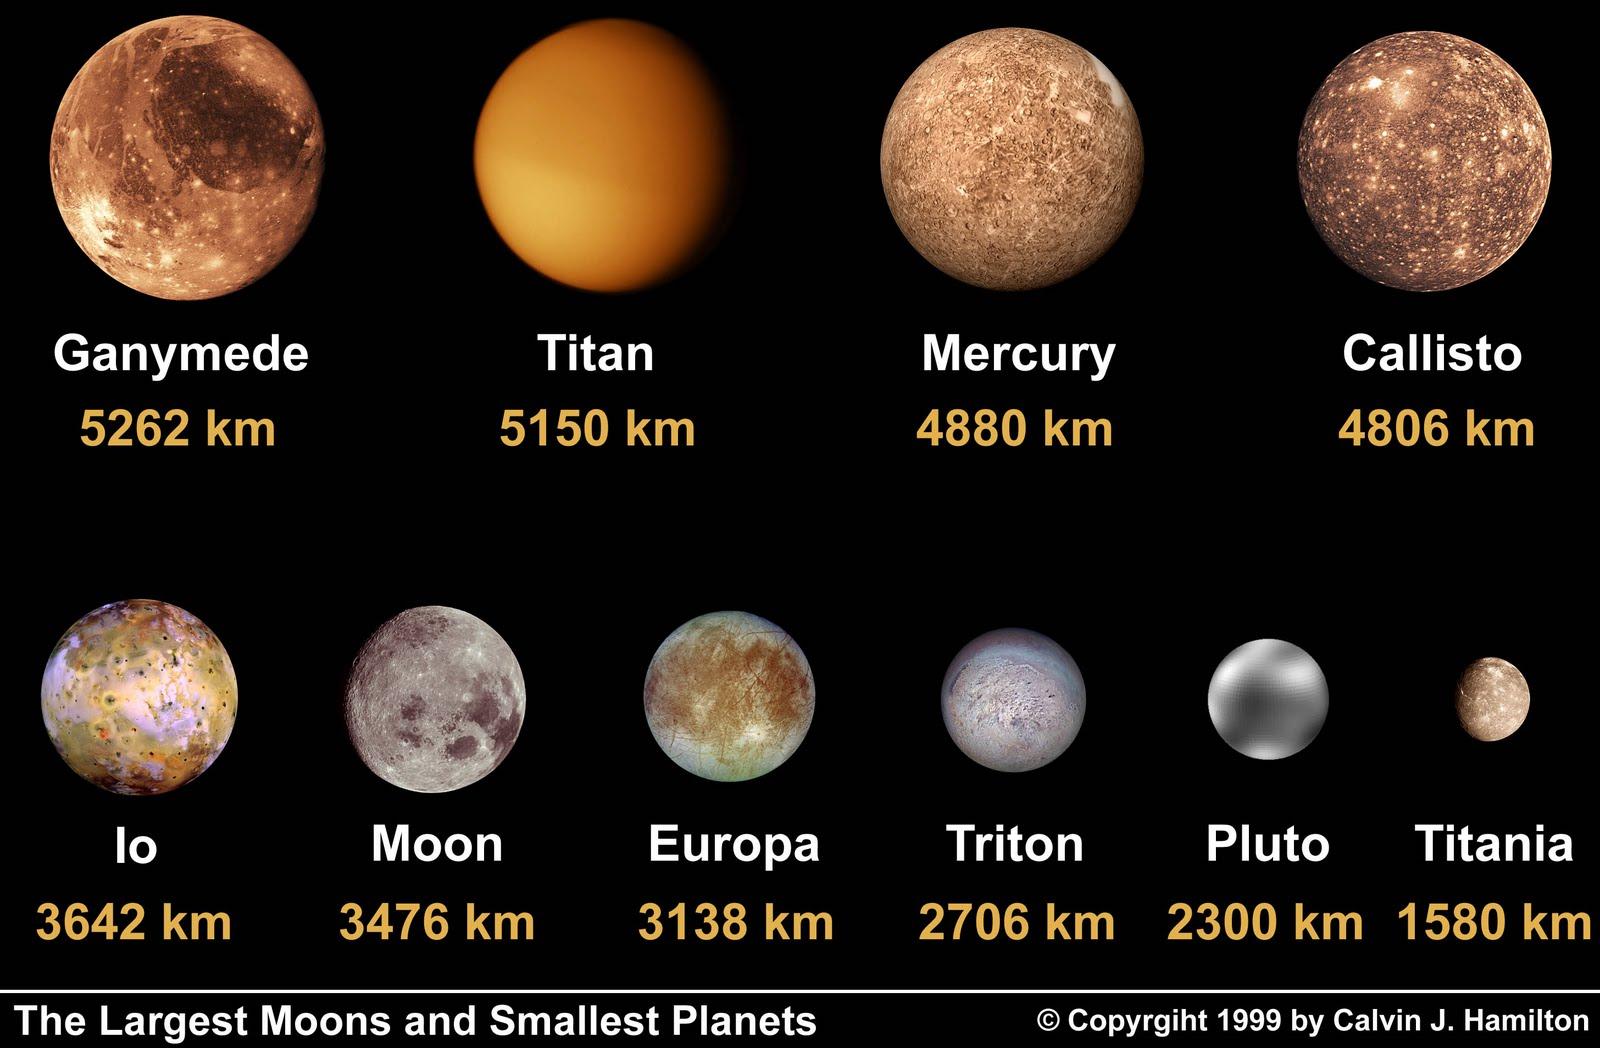 Space: Planet Mercury